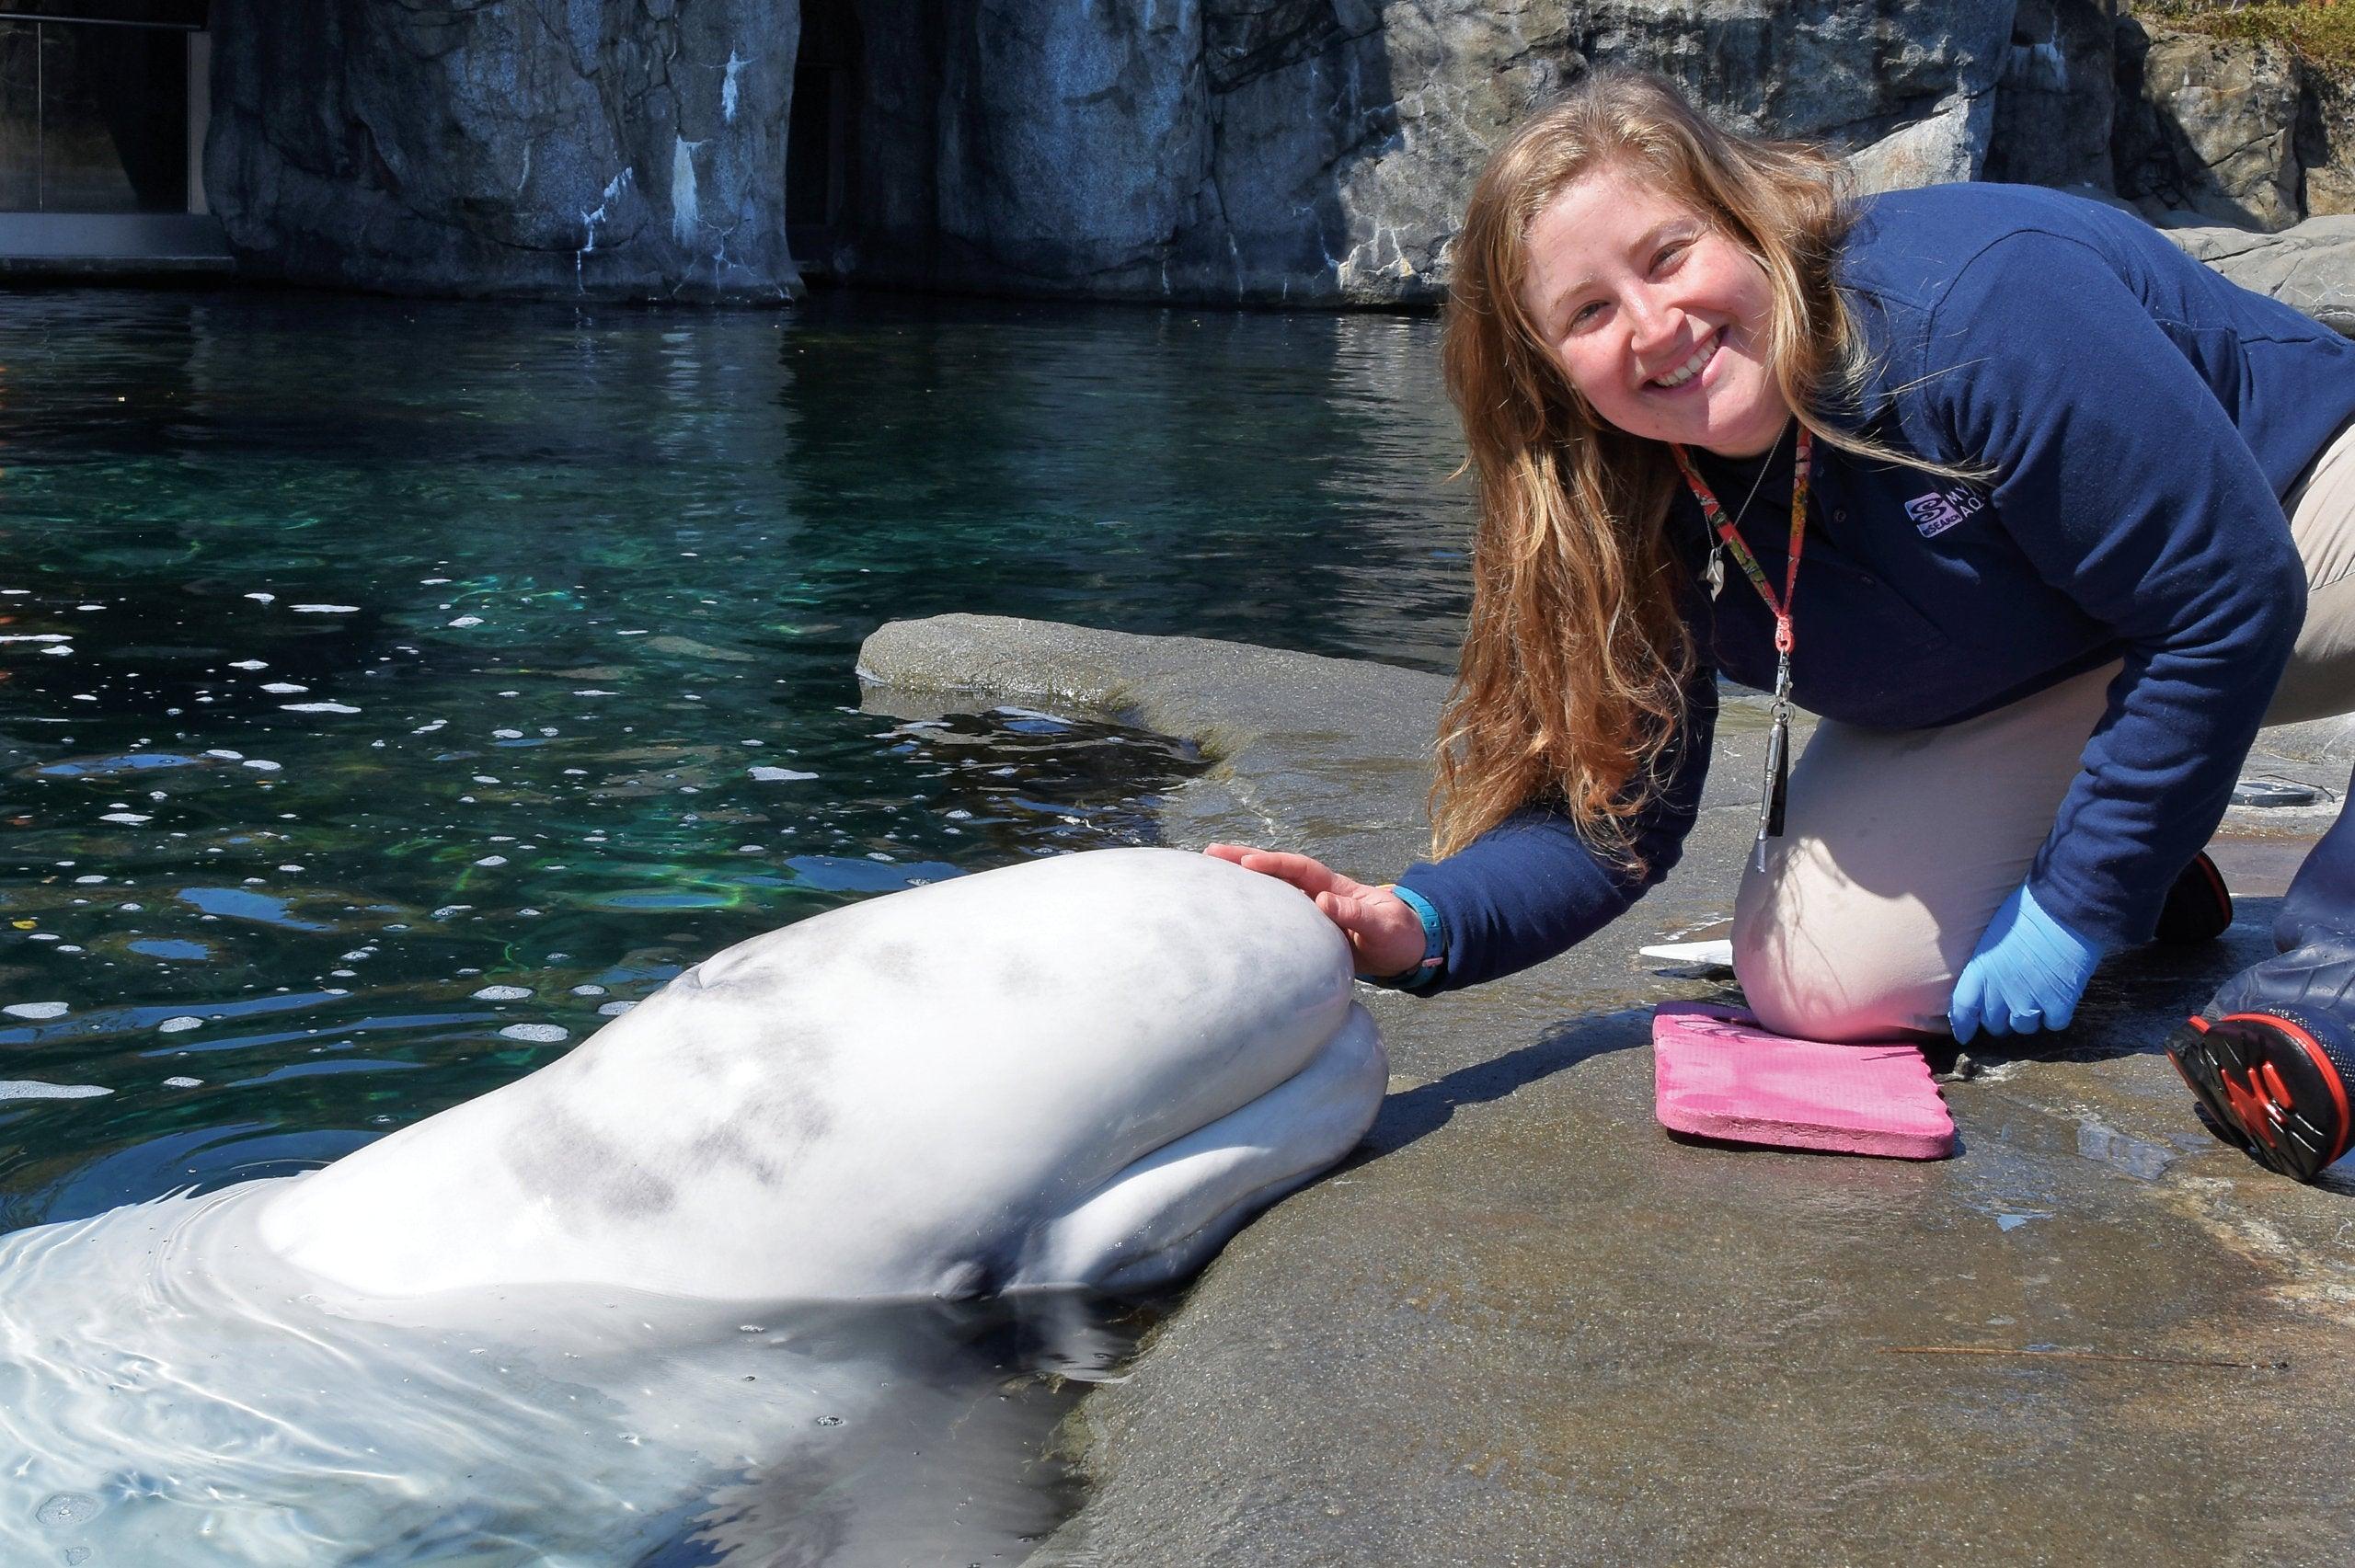 Allie (Seifert) Bruscato working with a white beluga whale at Mystic Aquarium